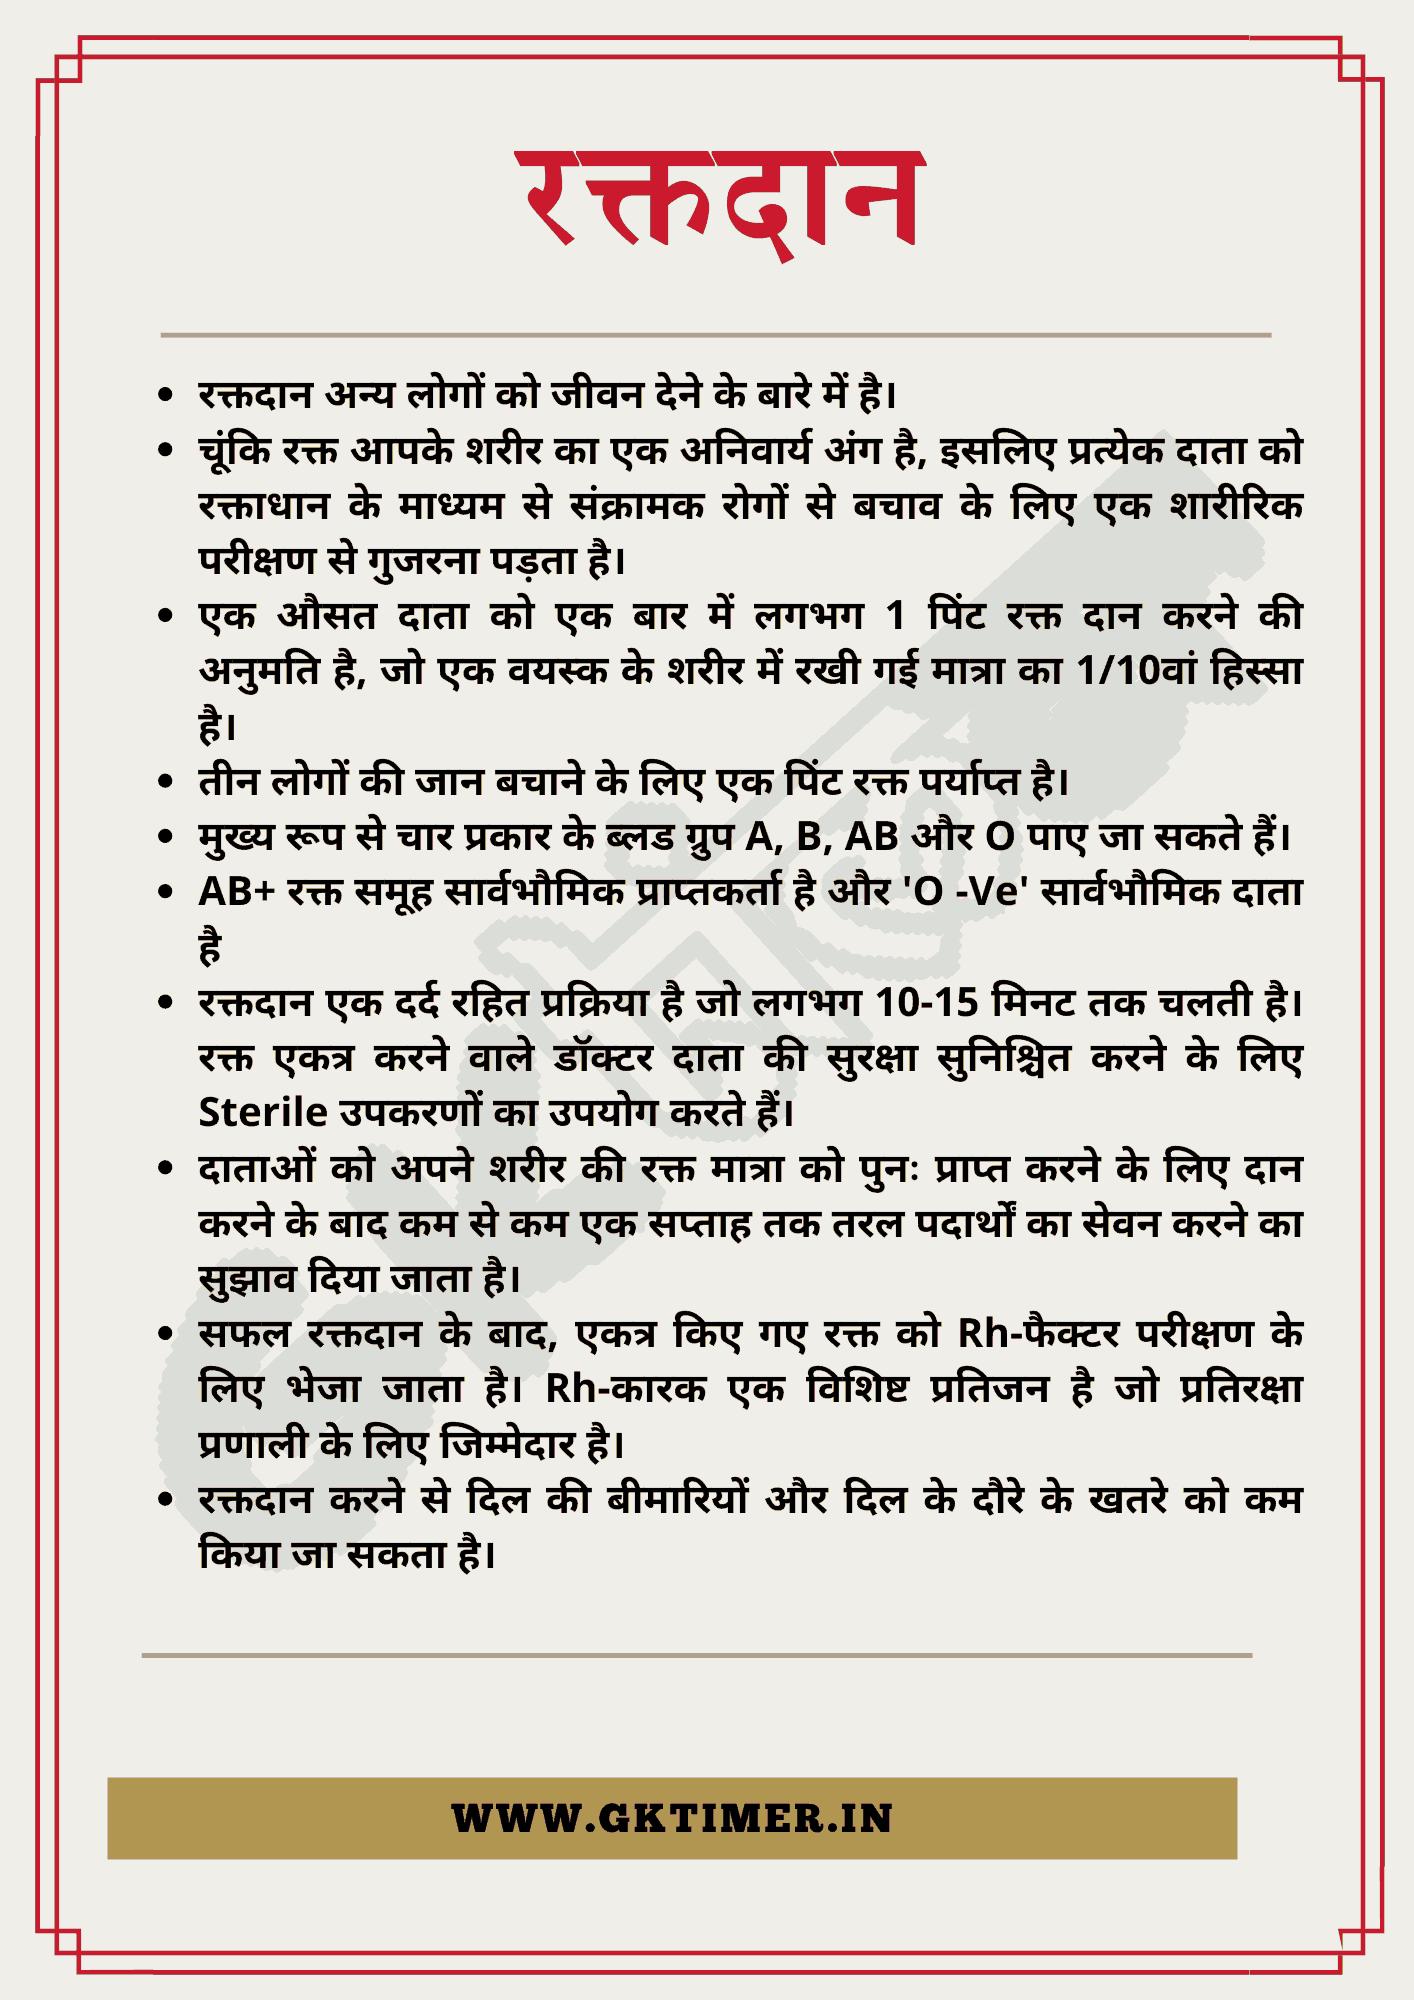 रक्तदान पर निबंध   Long and Short Essay on Blood Donation in Hindi   10 Lines on Blood Donation in Hindi